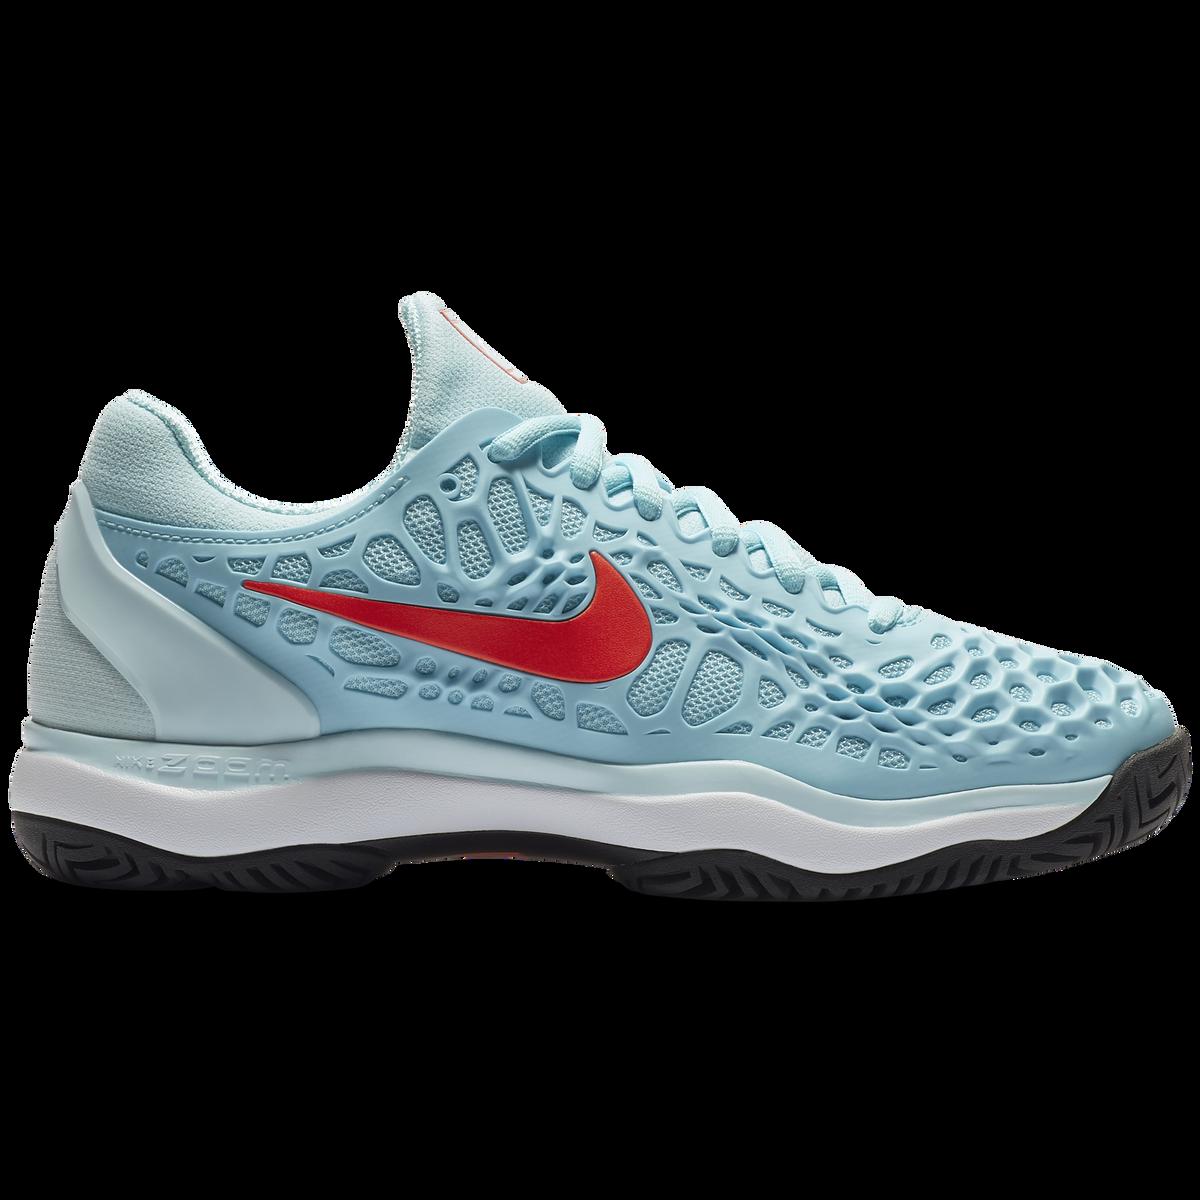 3a0851d26b3 Nike Zoom Cage 3 Women's Tennis Shoe - Light Blue